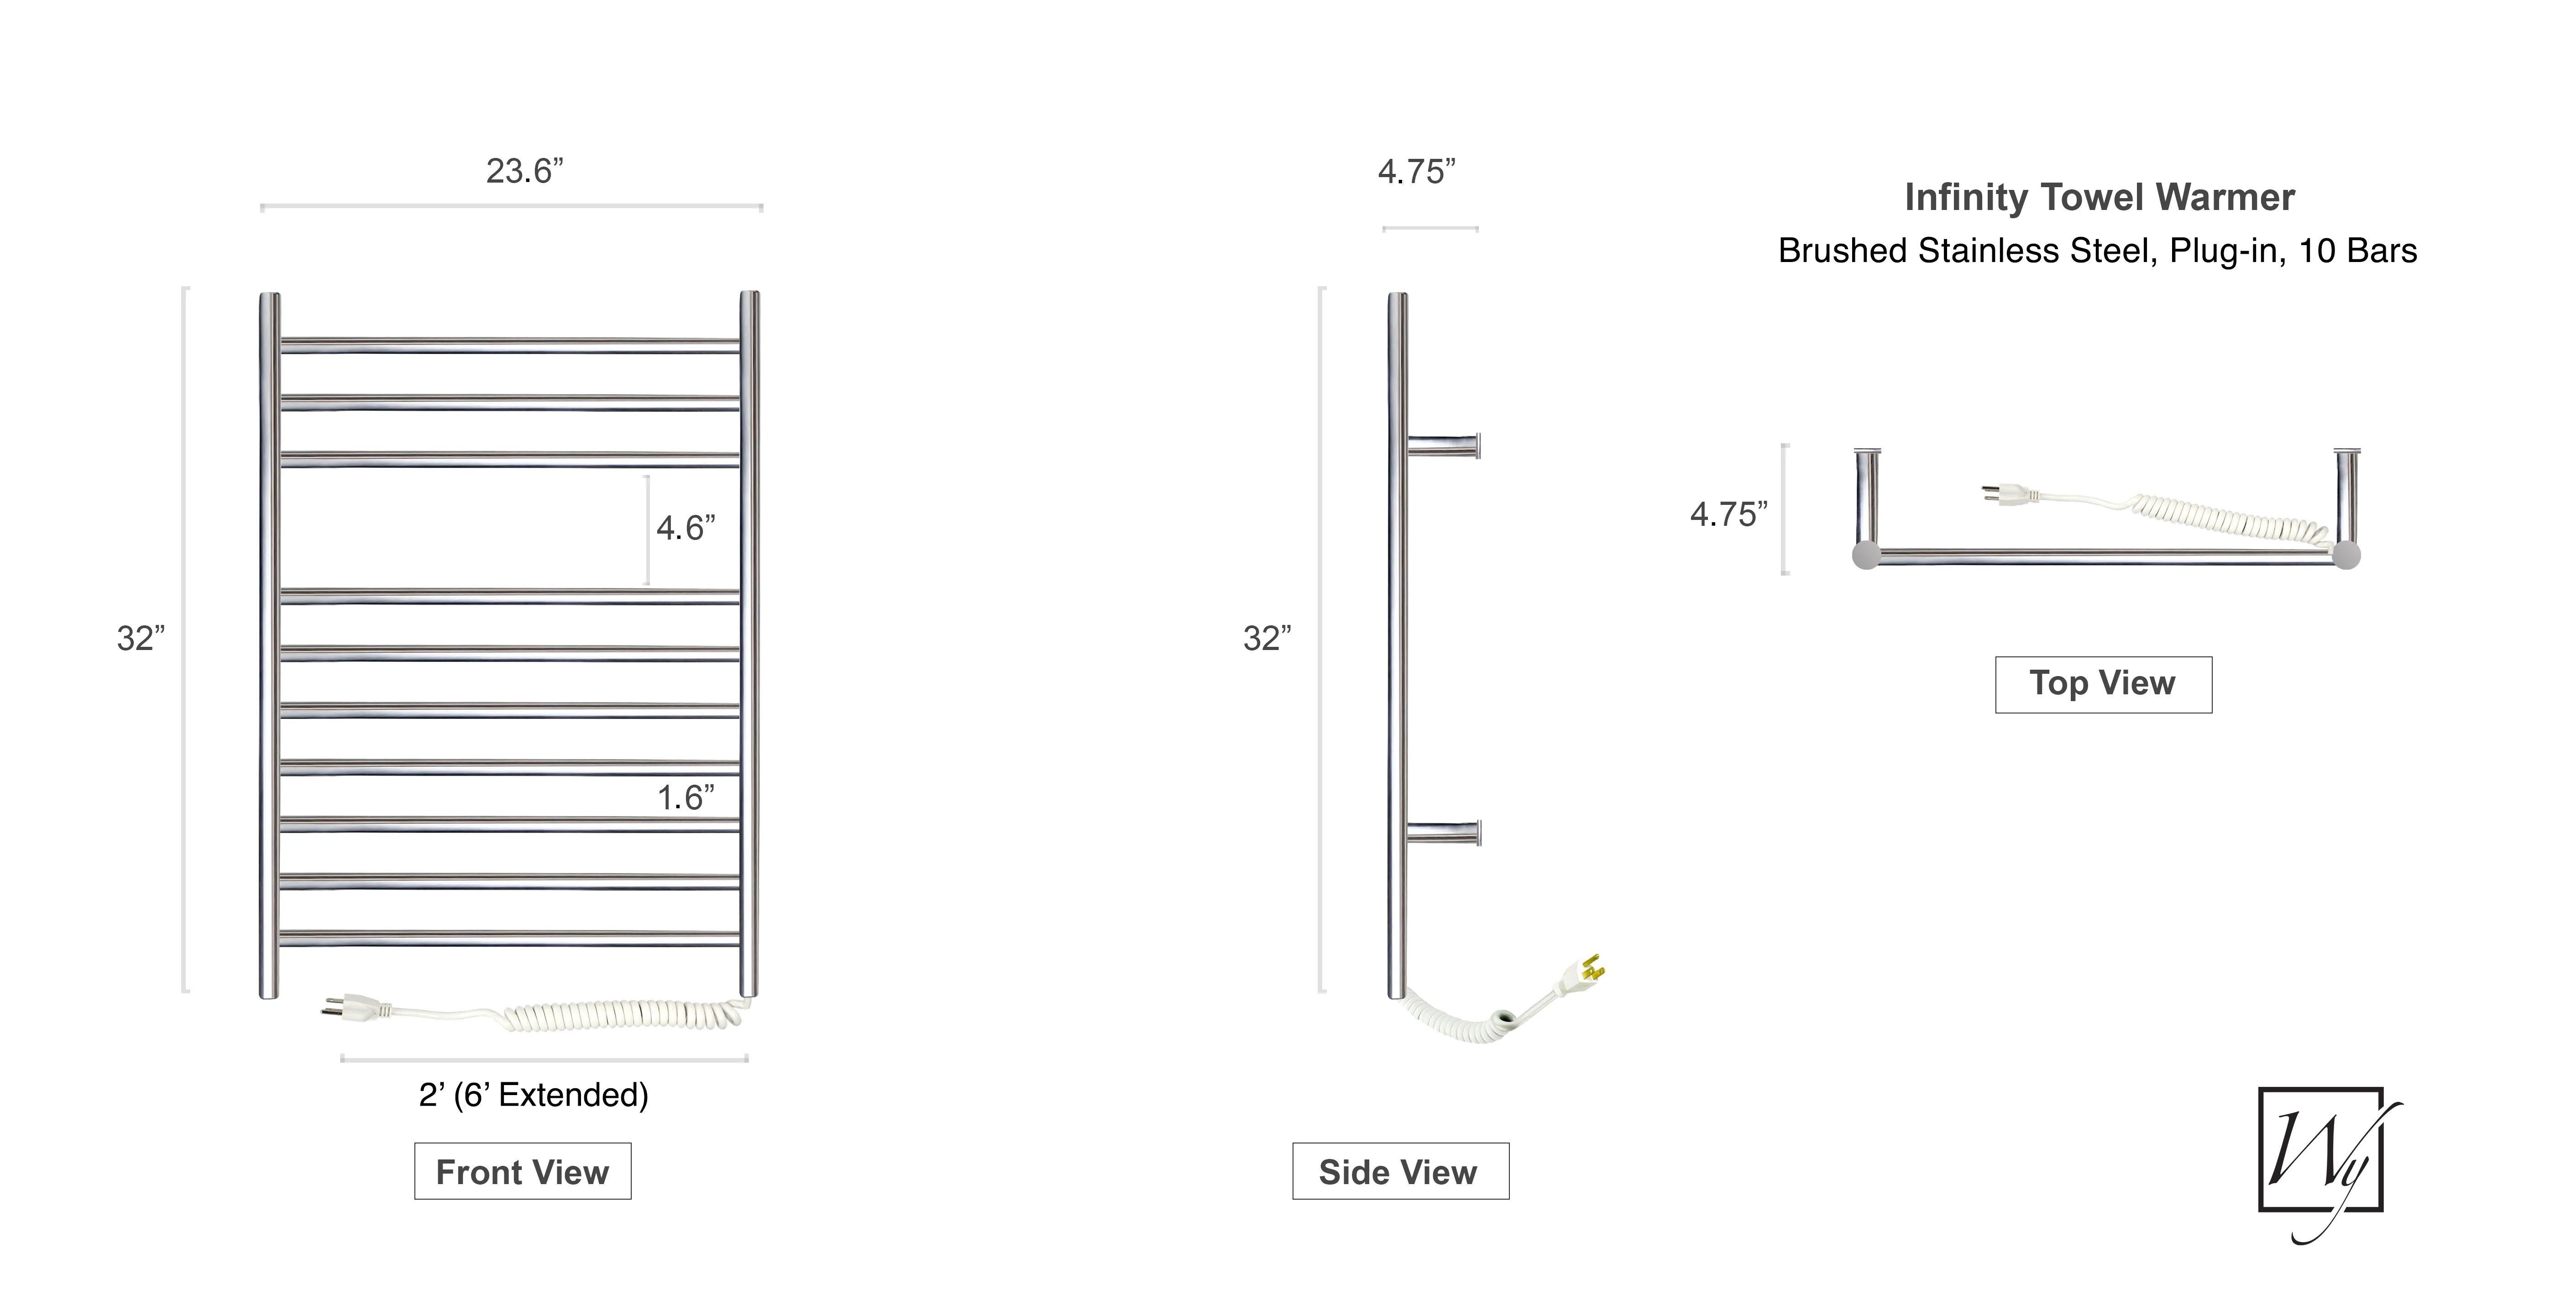 infinity spa keypad wiring diagram